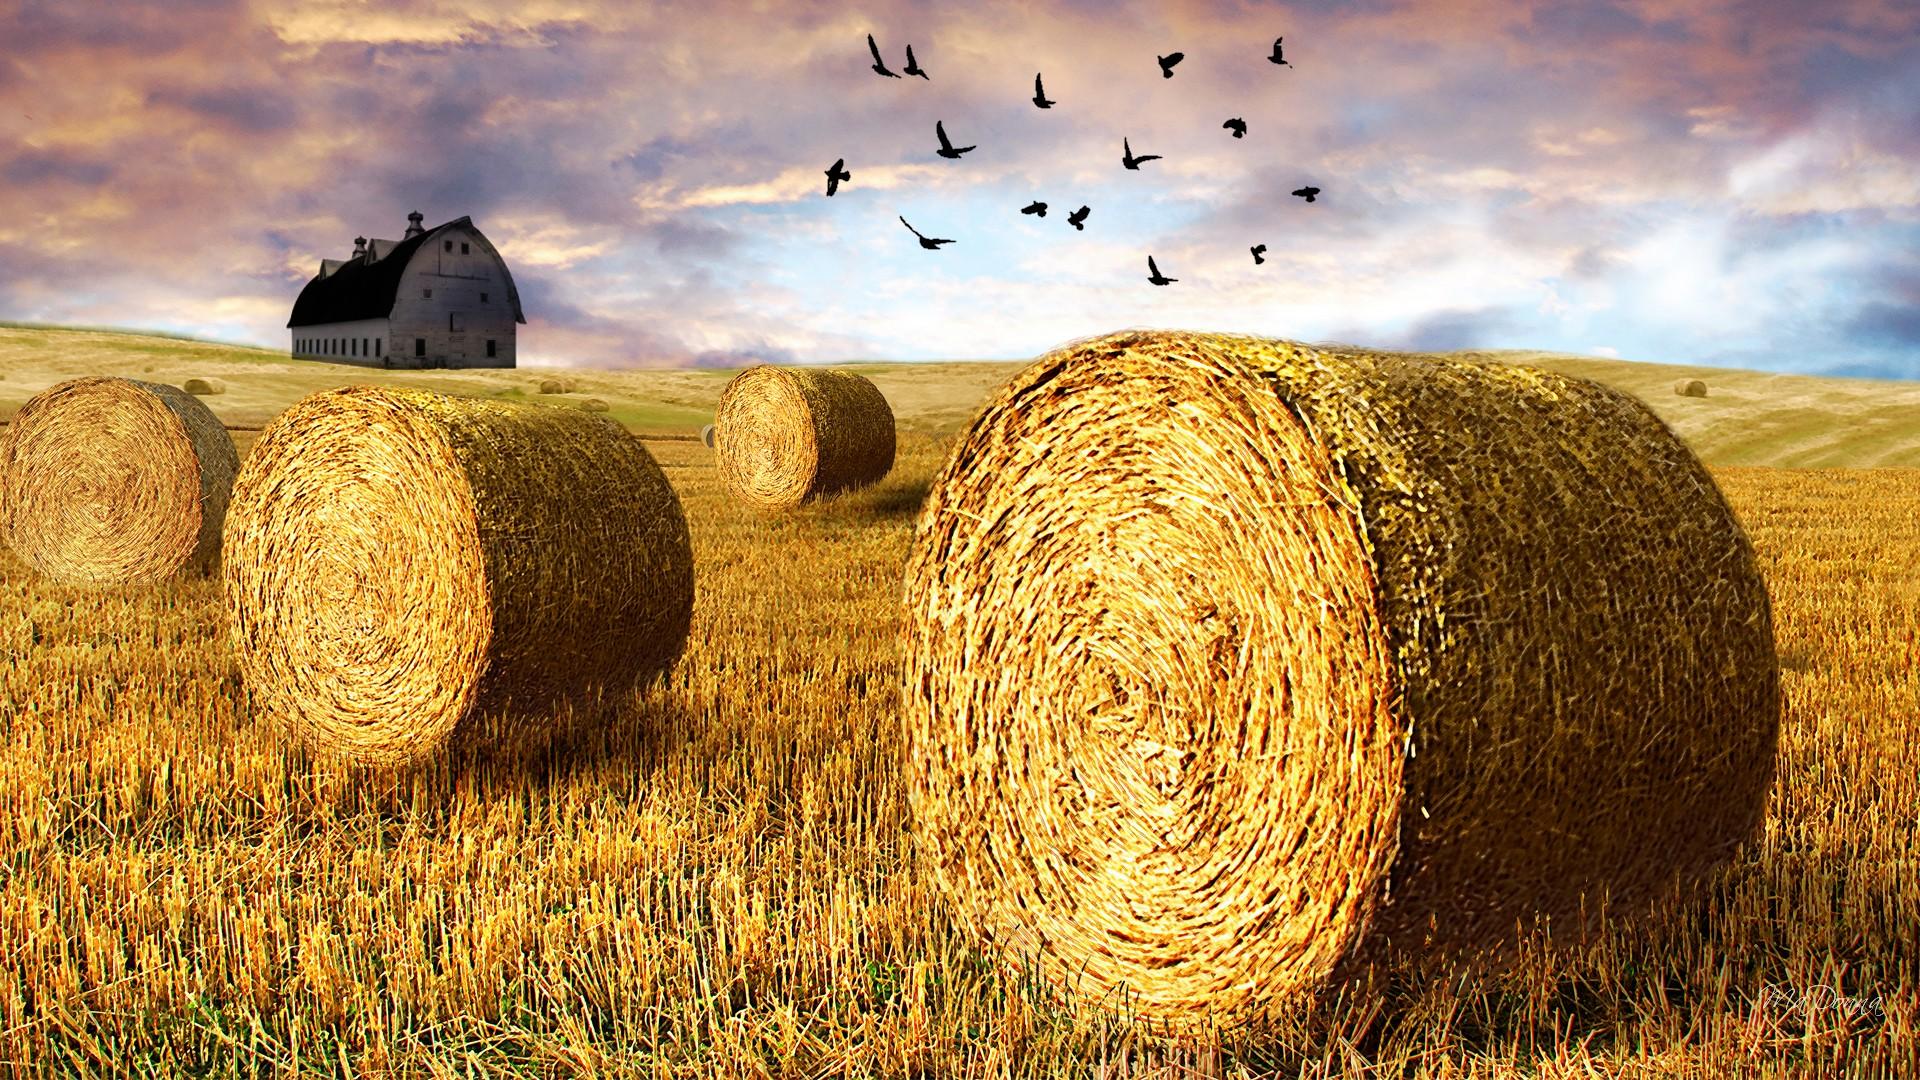 Hay Wallpaper 32979 1680x1050 px